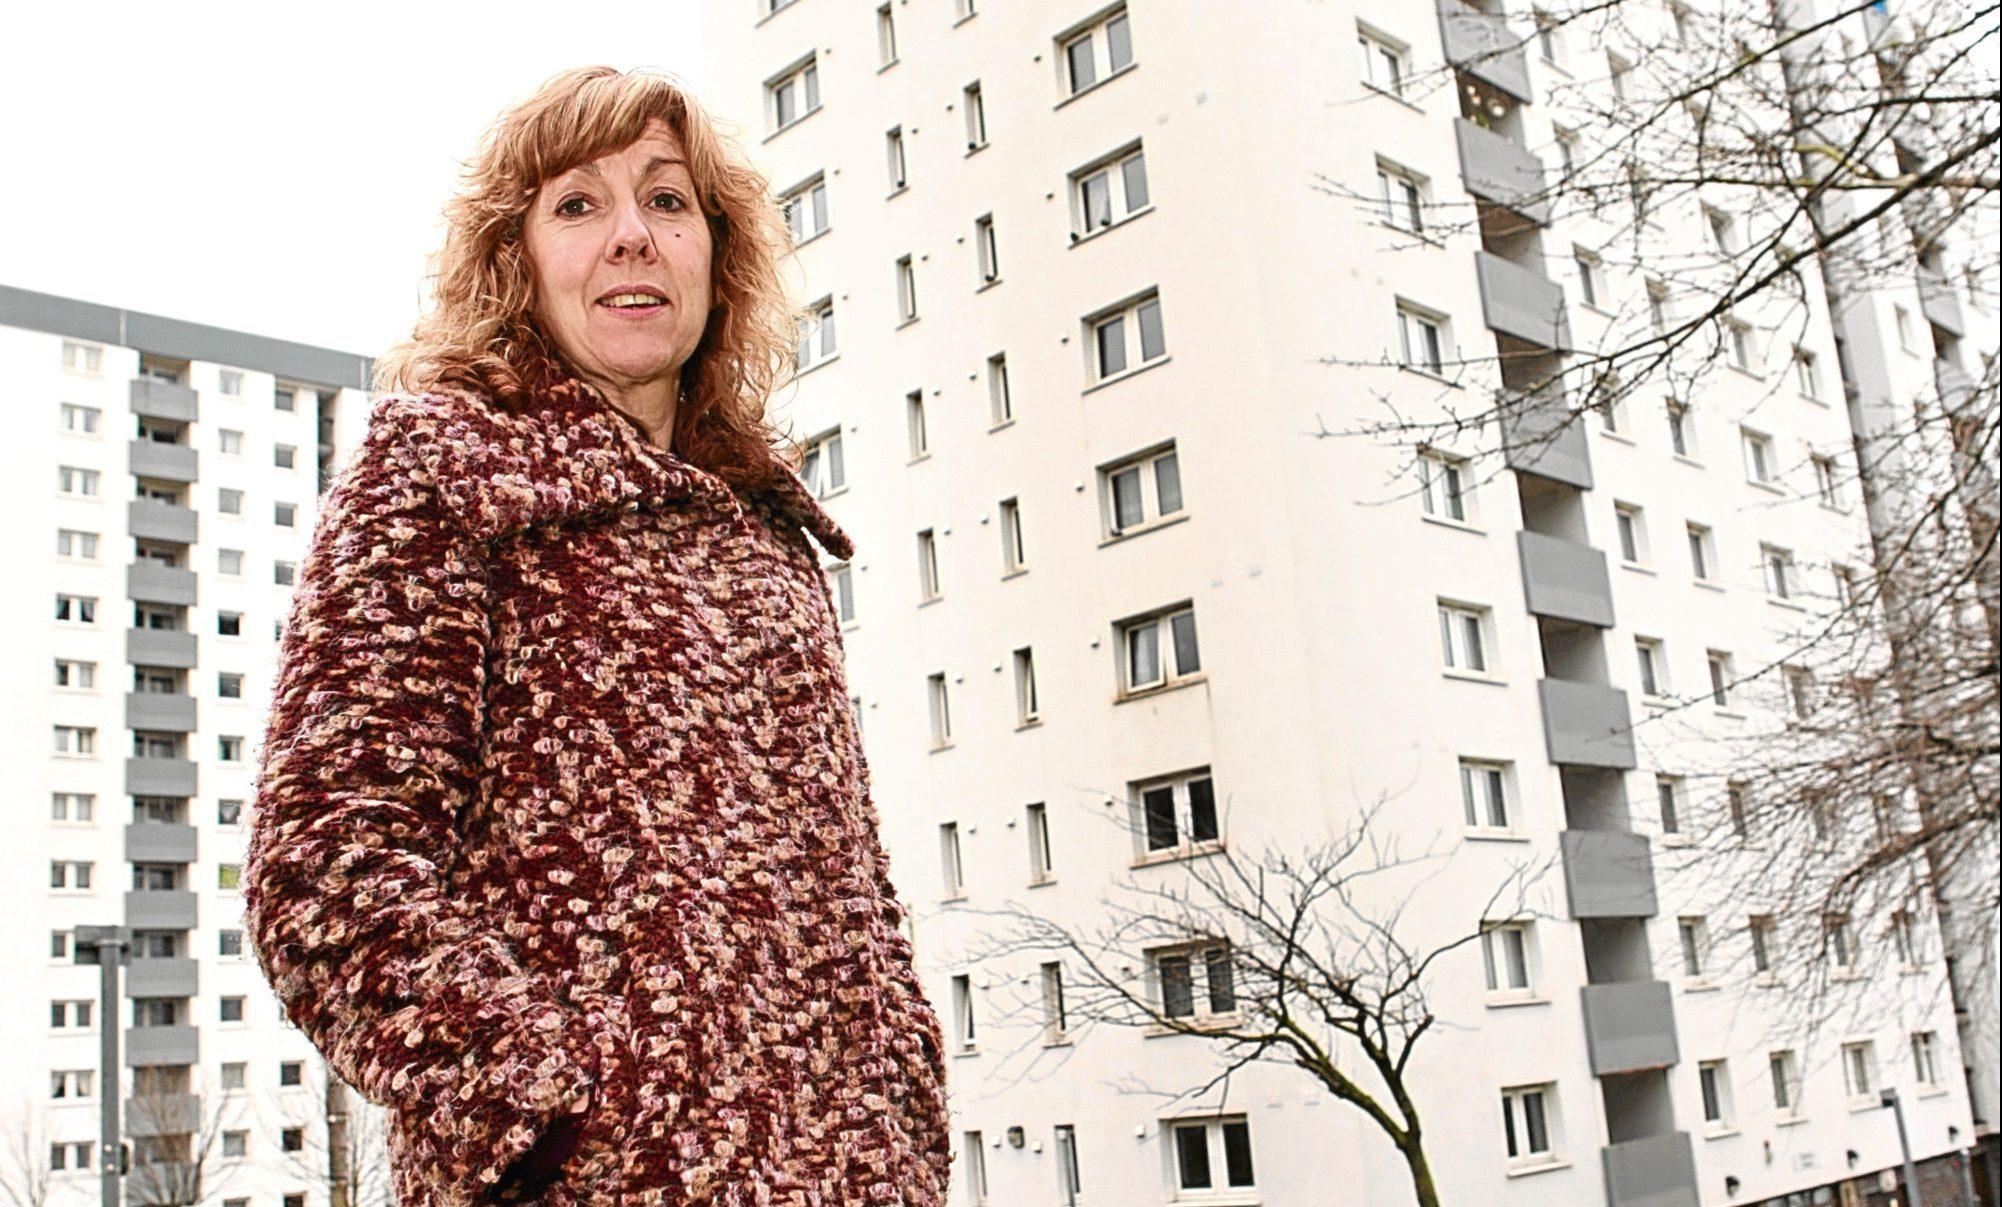 Elaine Zwirlein, the city council's director of neighbourhood services